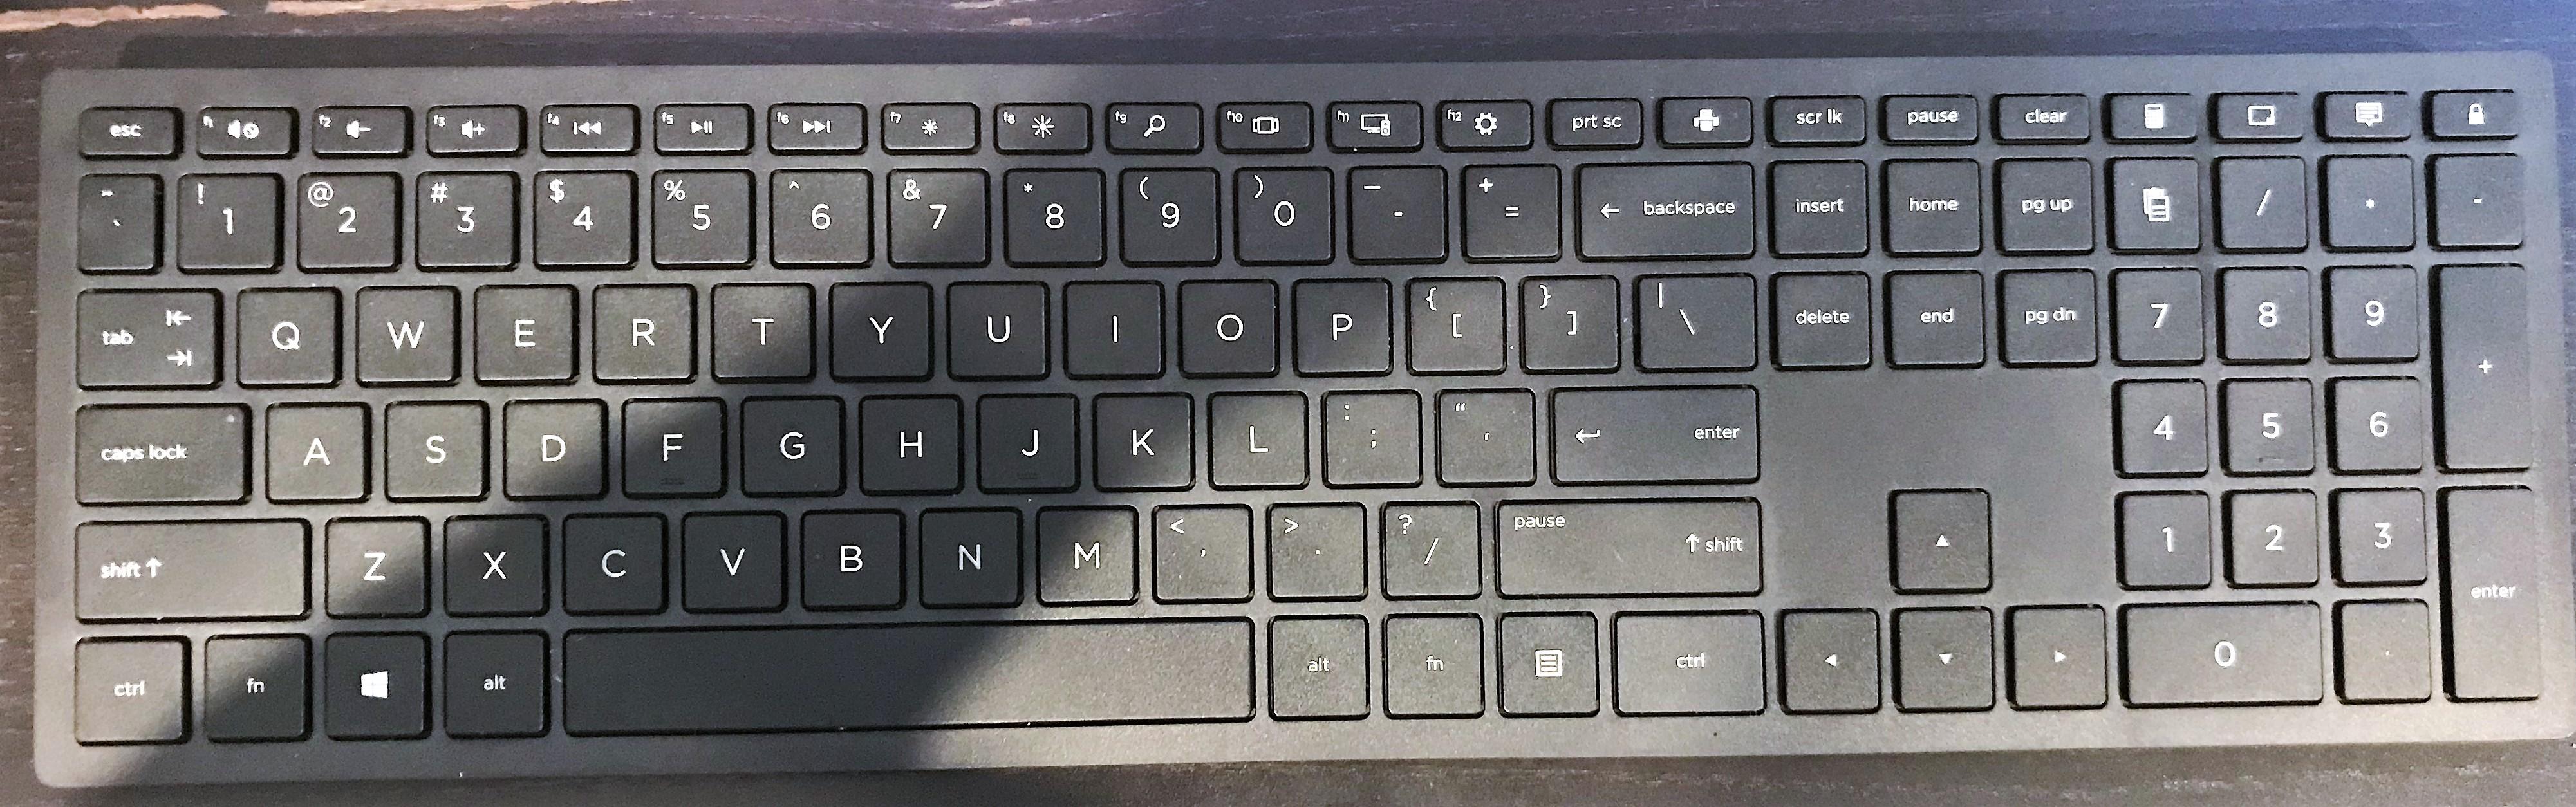 FN key lock on new Pavillion Desktop - No BIOS option - HP